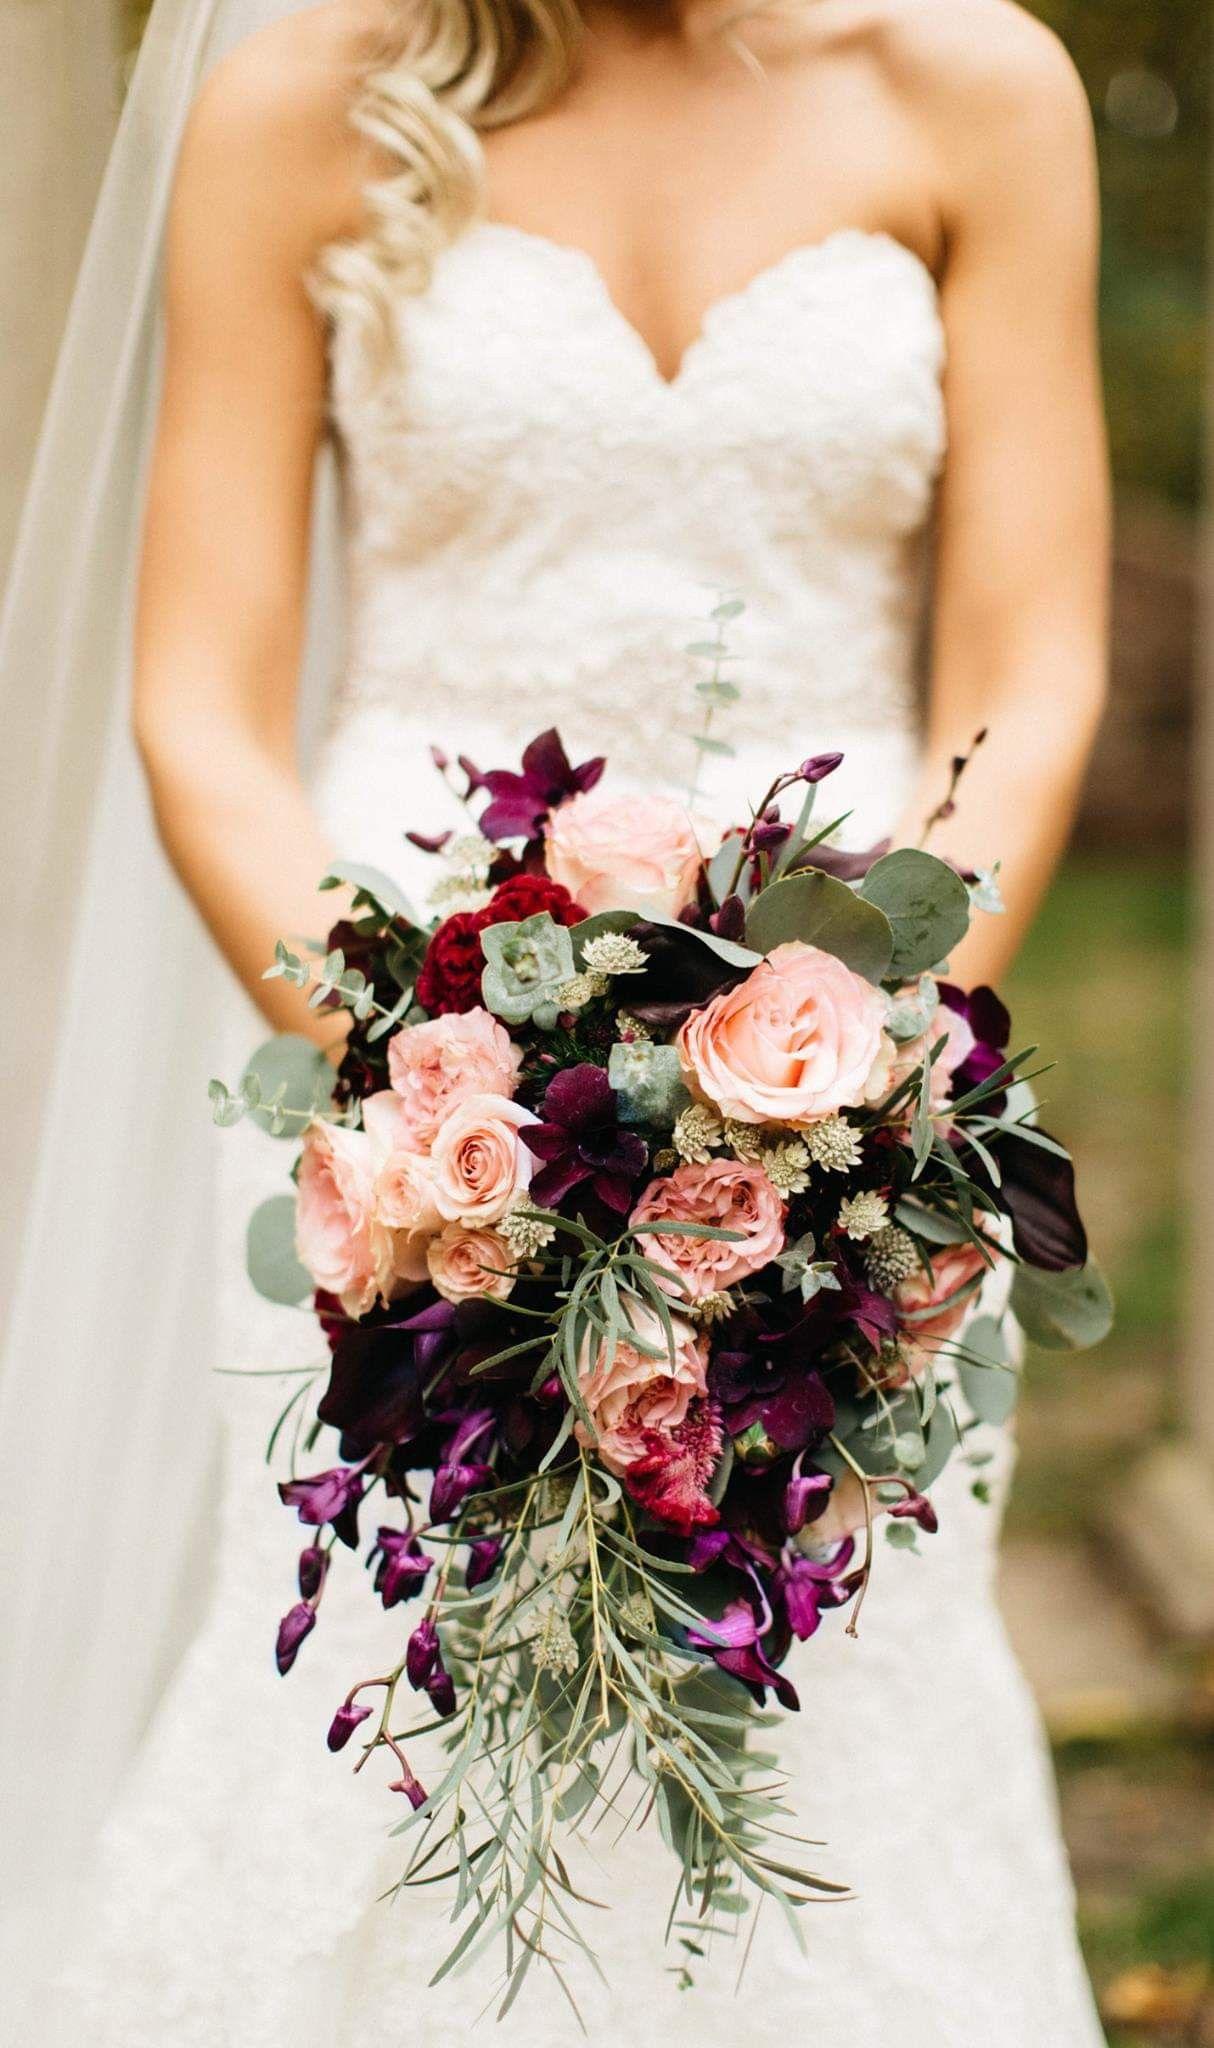 Blush and Burgundy Cascade bouquet for a fall wedding